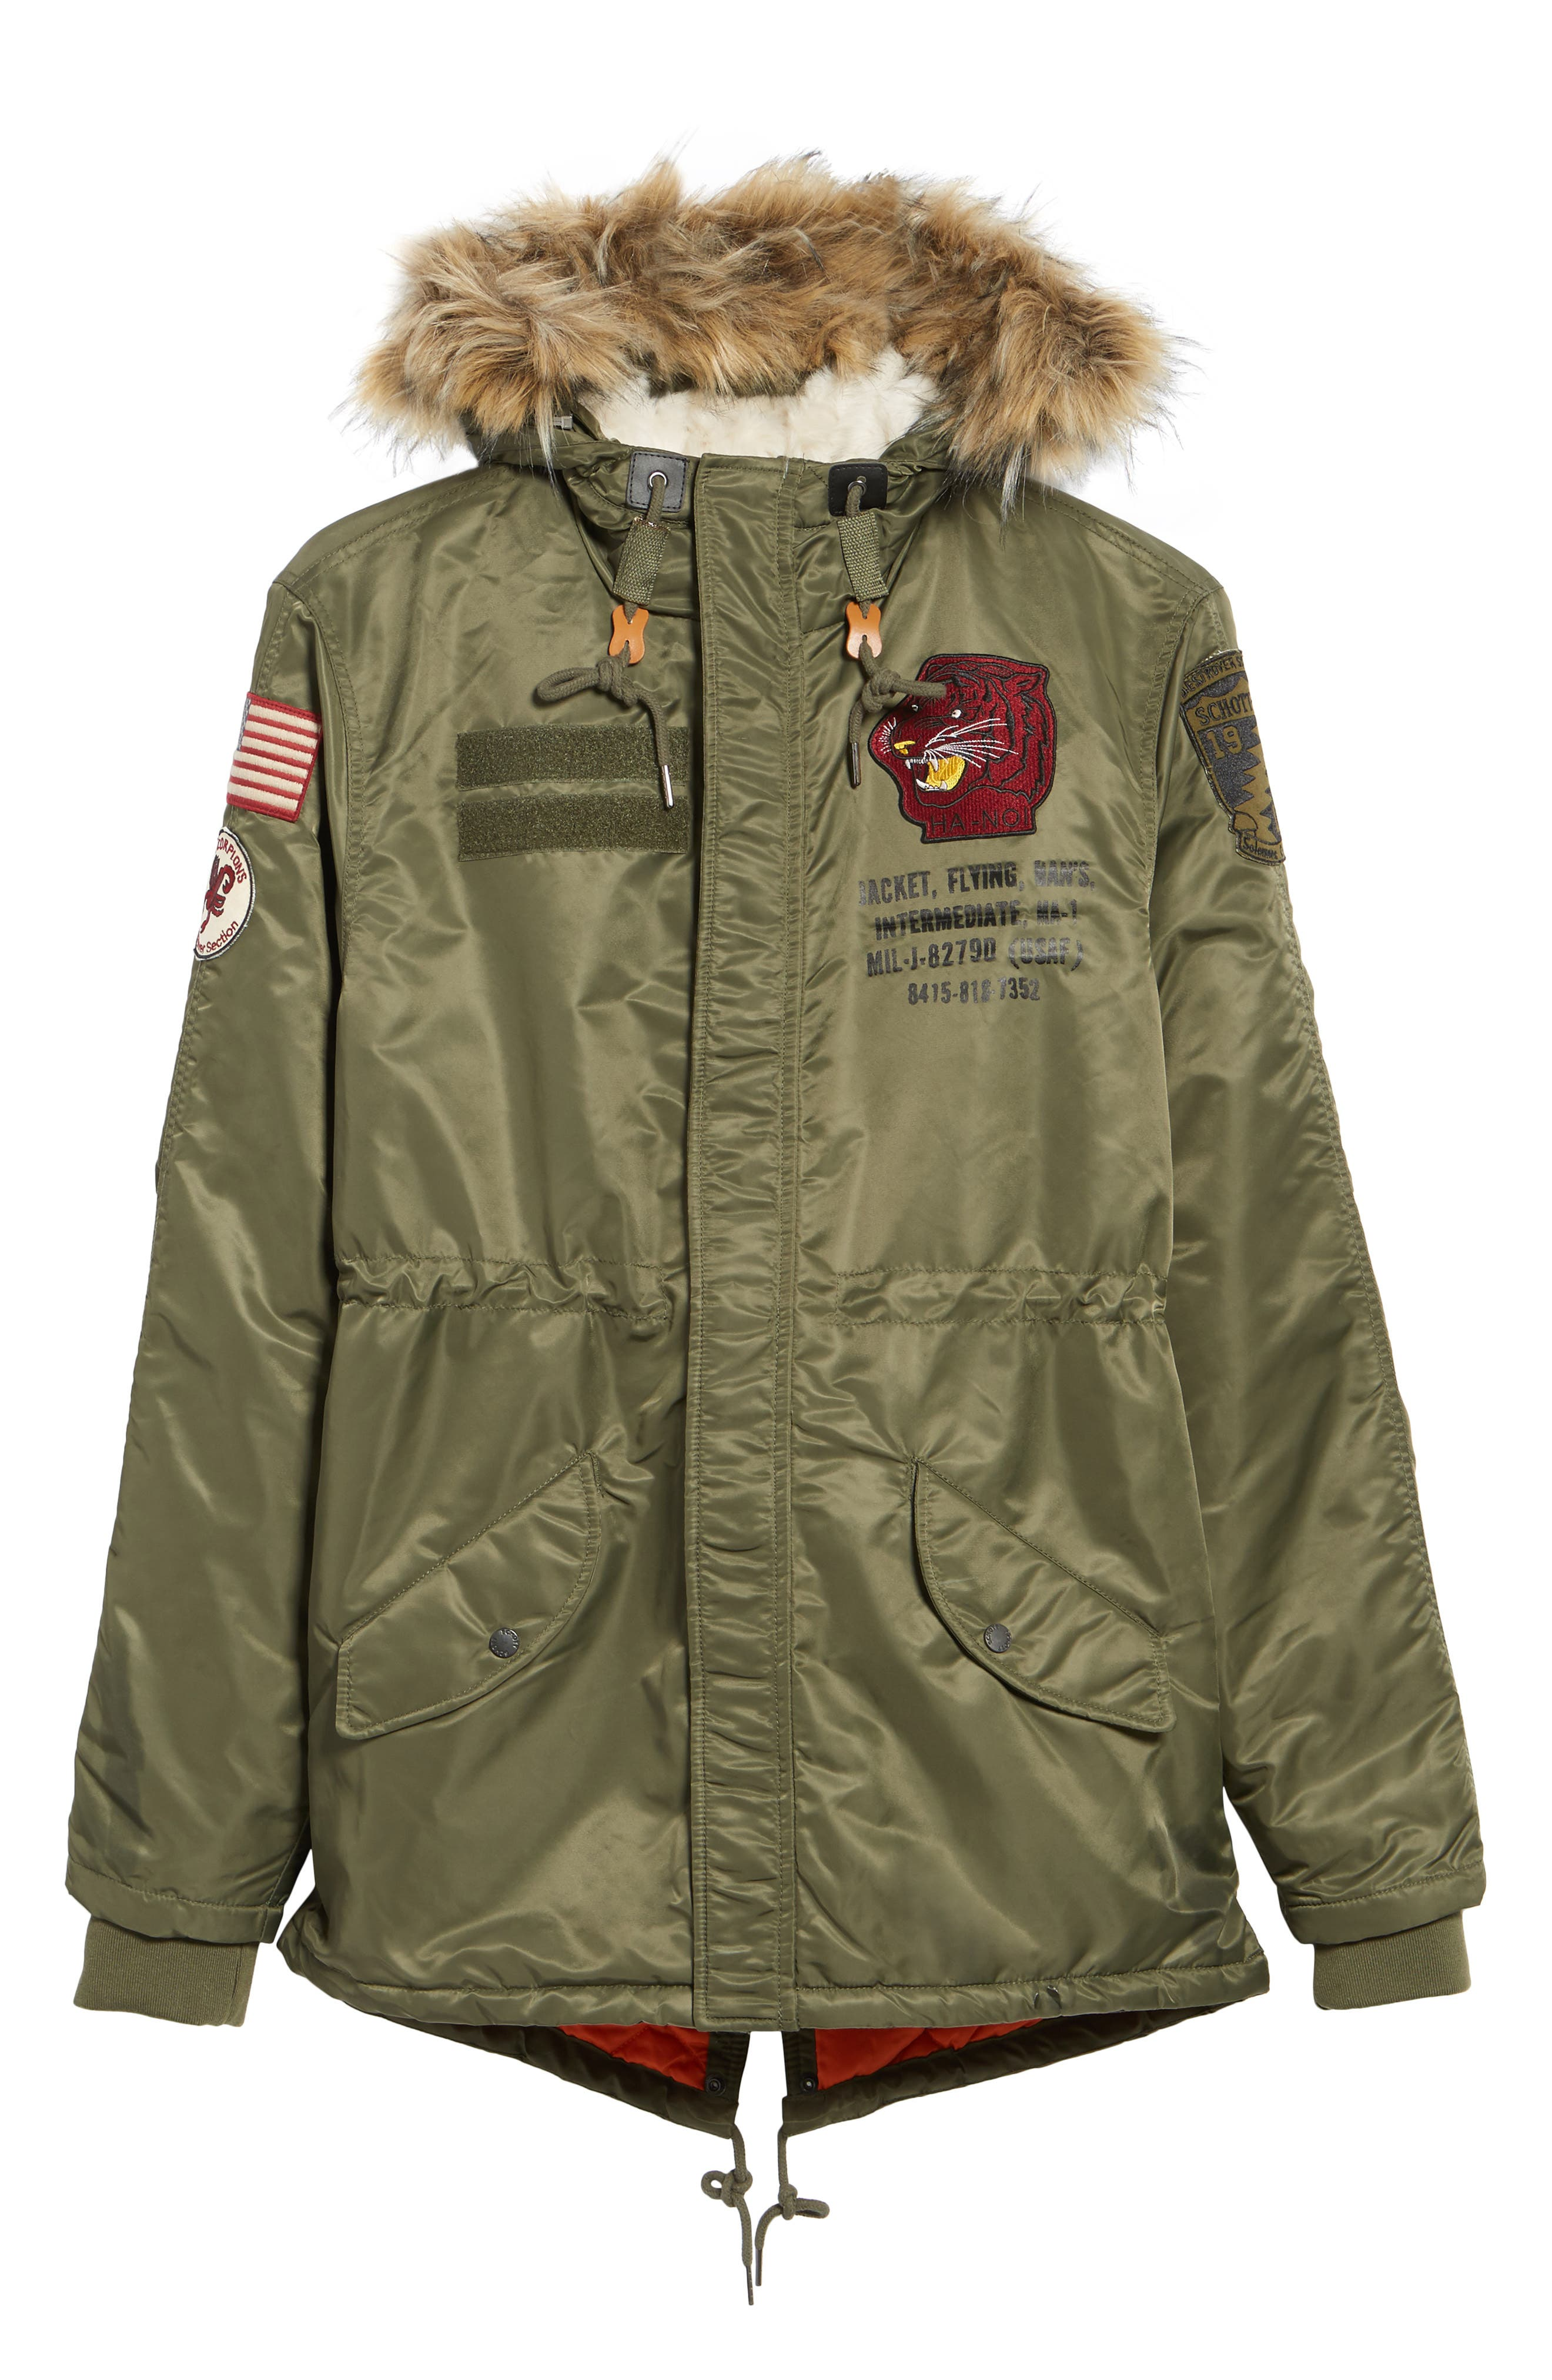 N3-B Snorkel Flight Jacket with Faux Fur Trim & Lining,                             Alternate thumbnail 10, color,